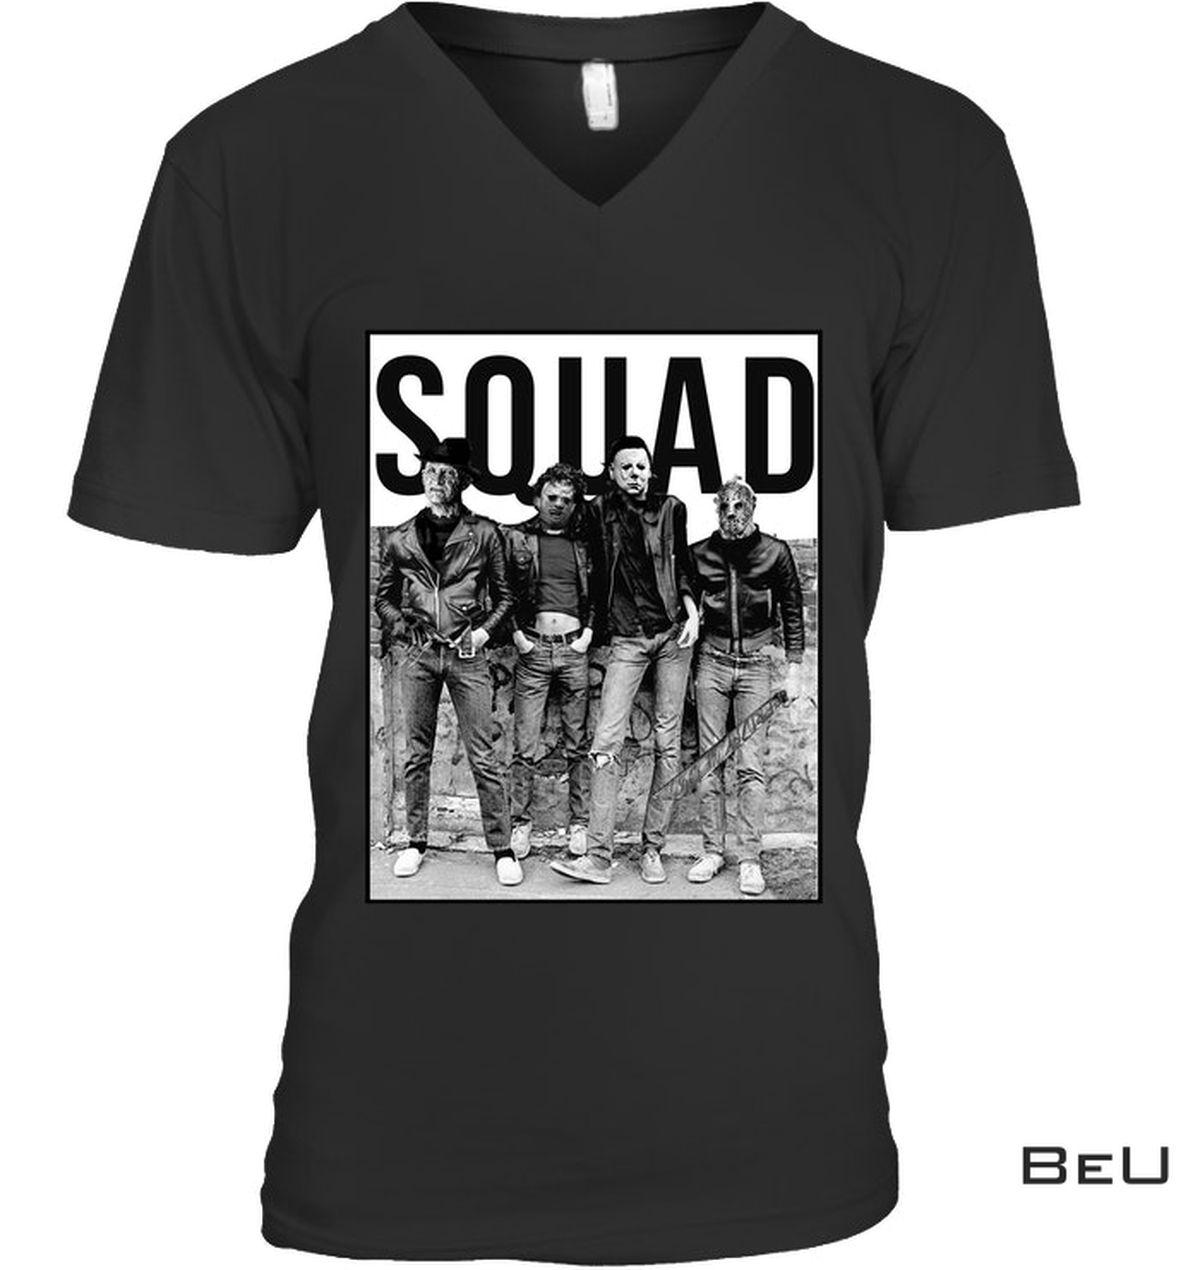 New Halloween Squad Shirt, hoodie, tank top